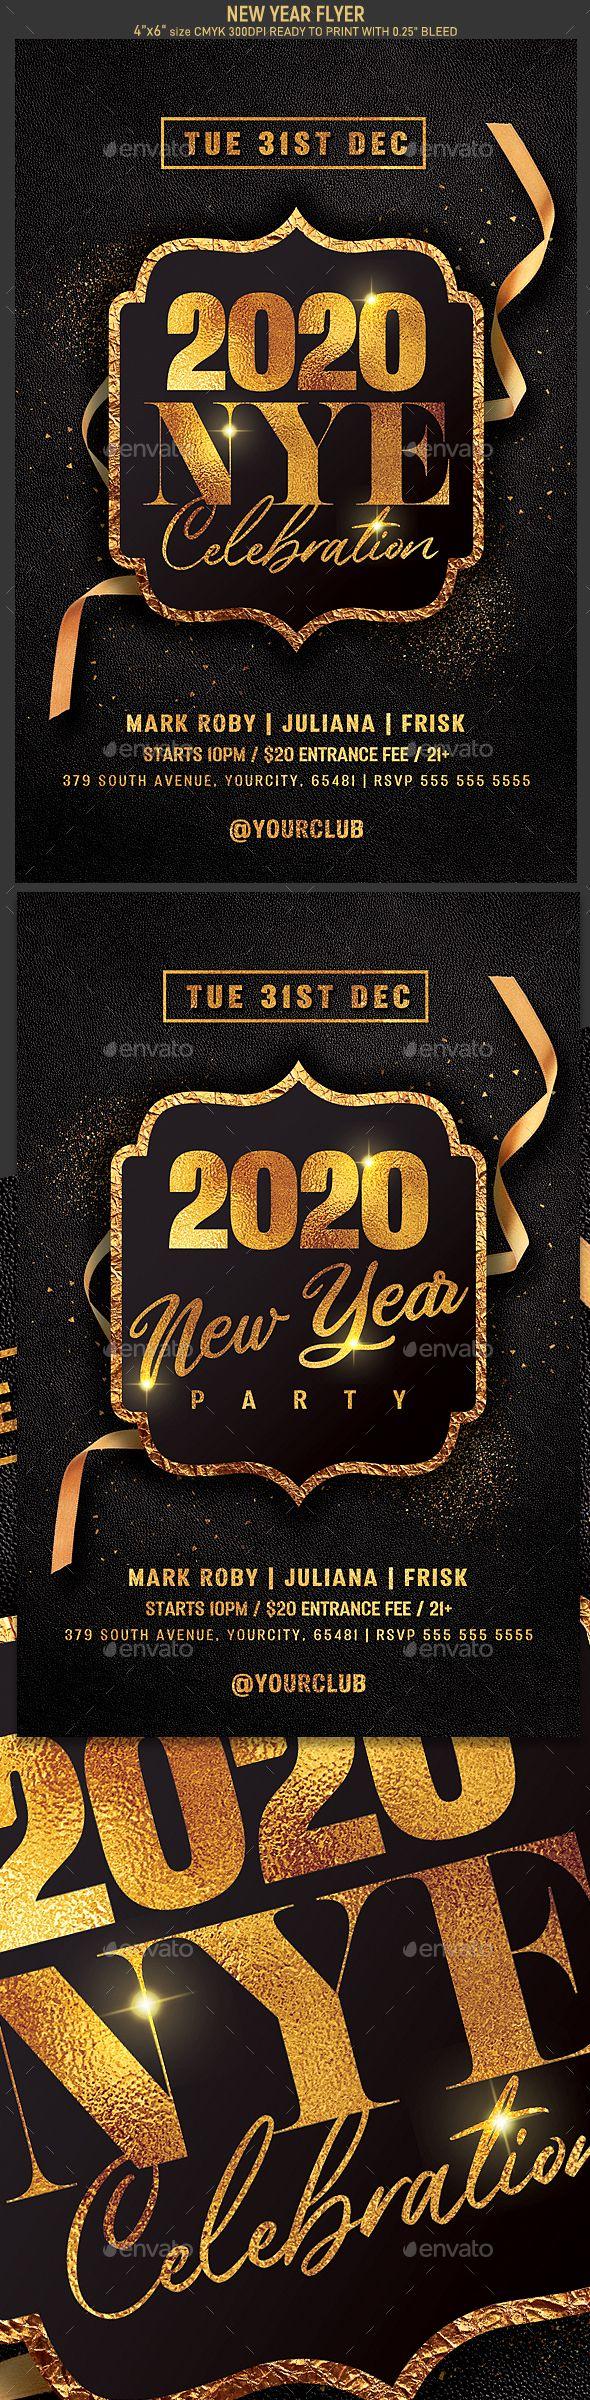 New Year Flyer Flyer, Print templates, Christmas flyer